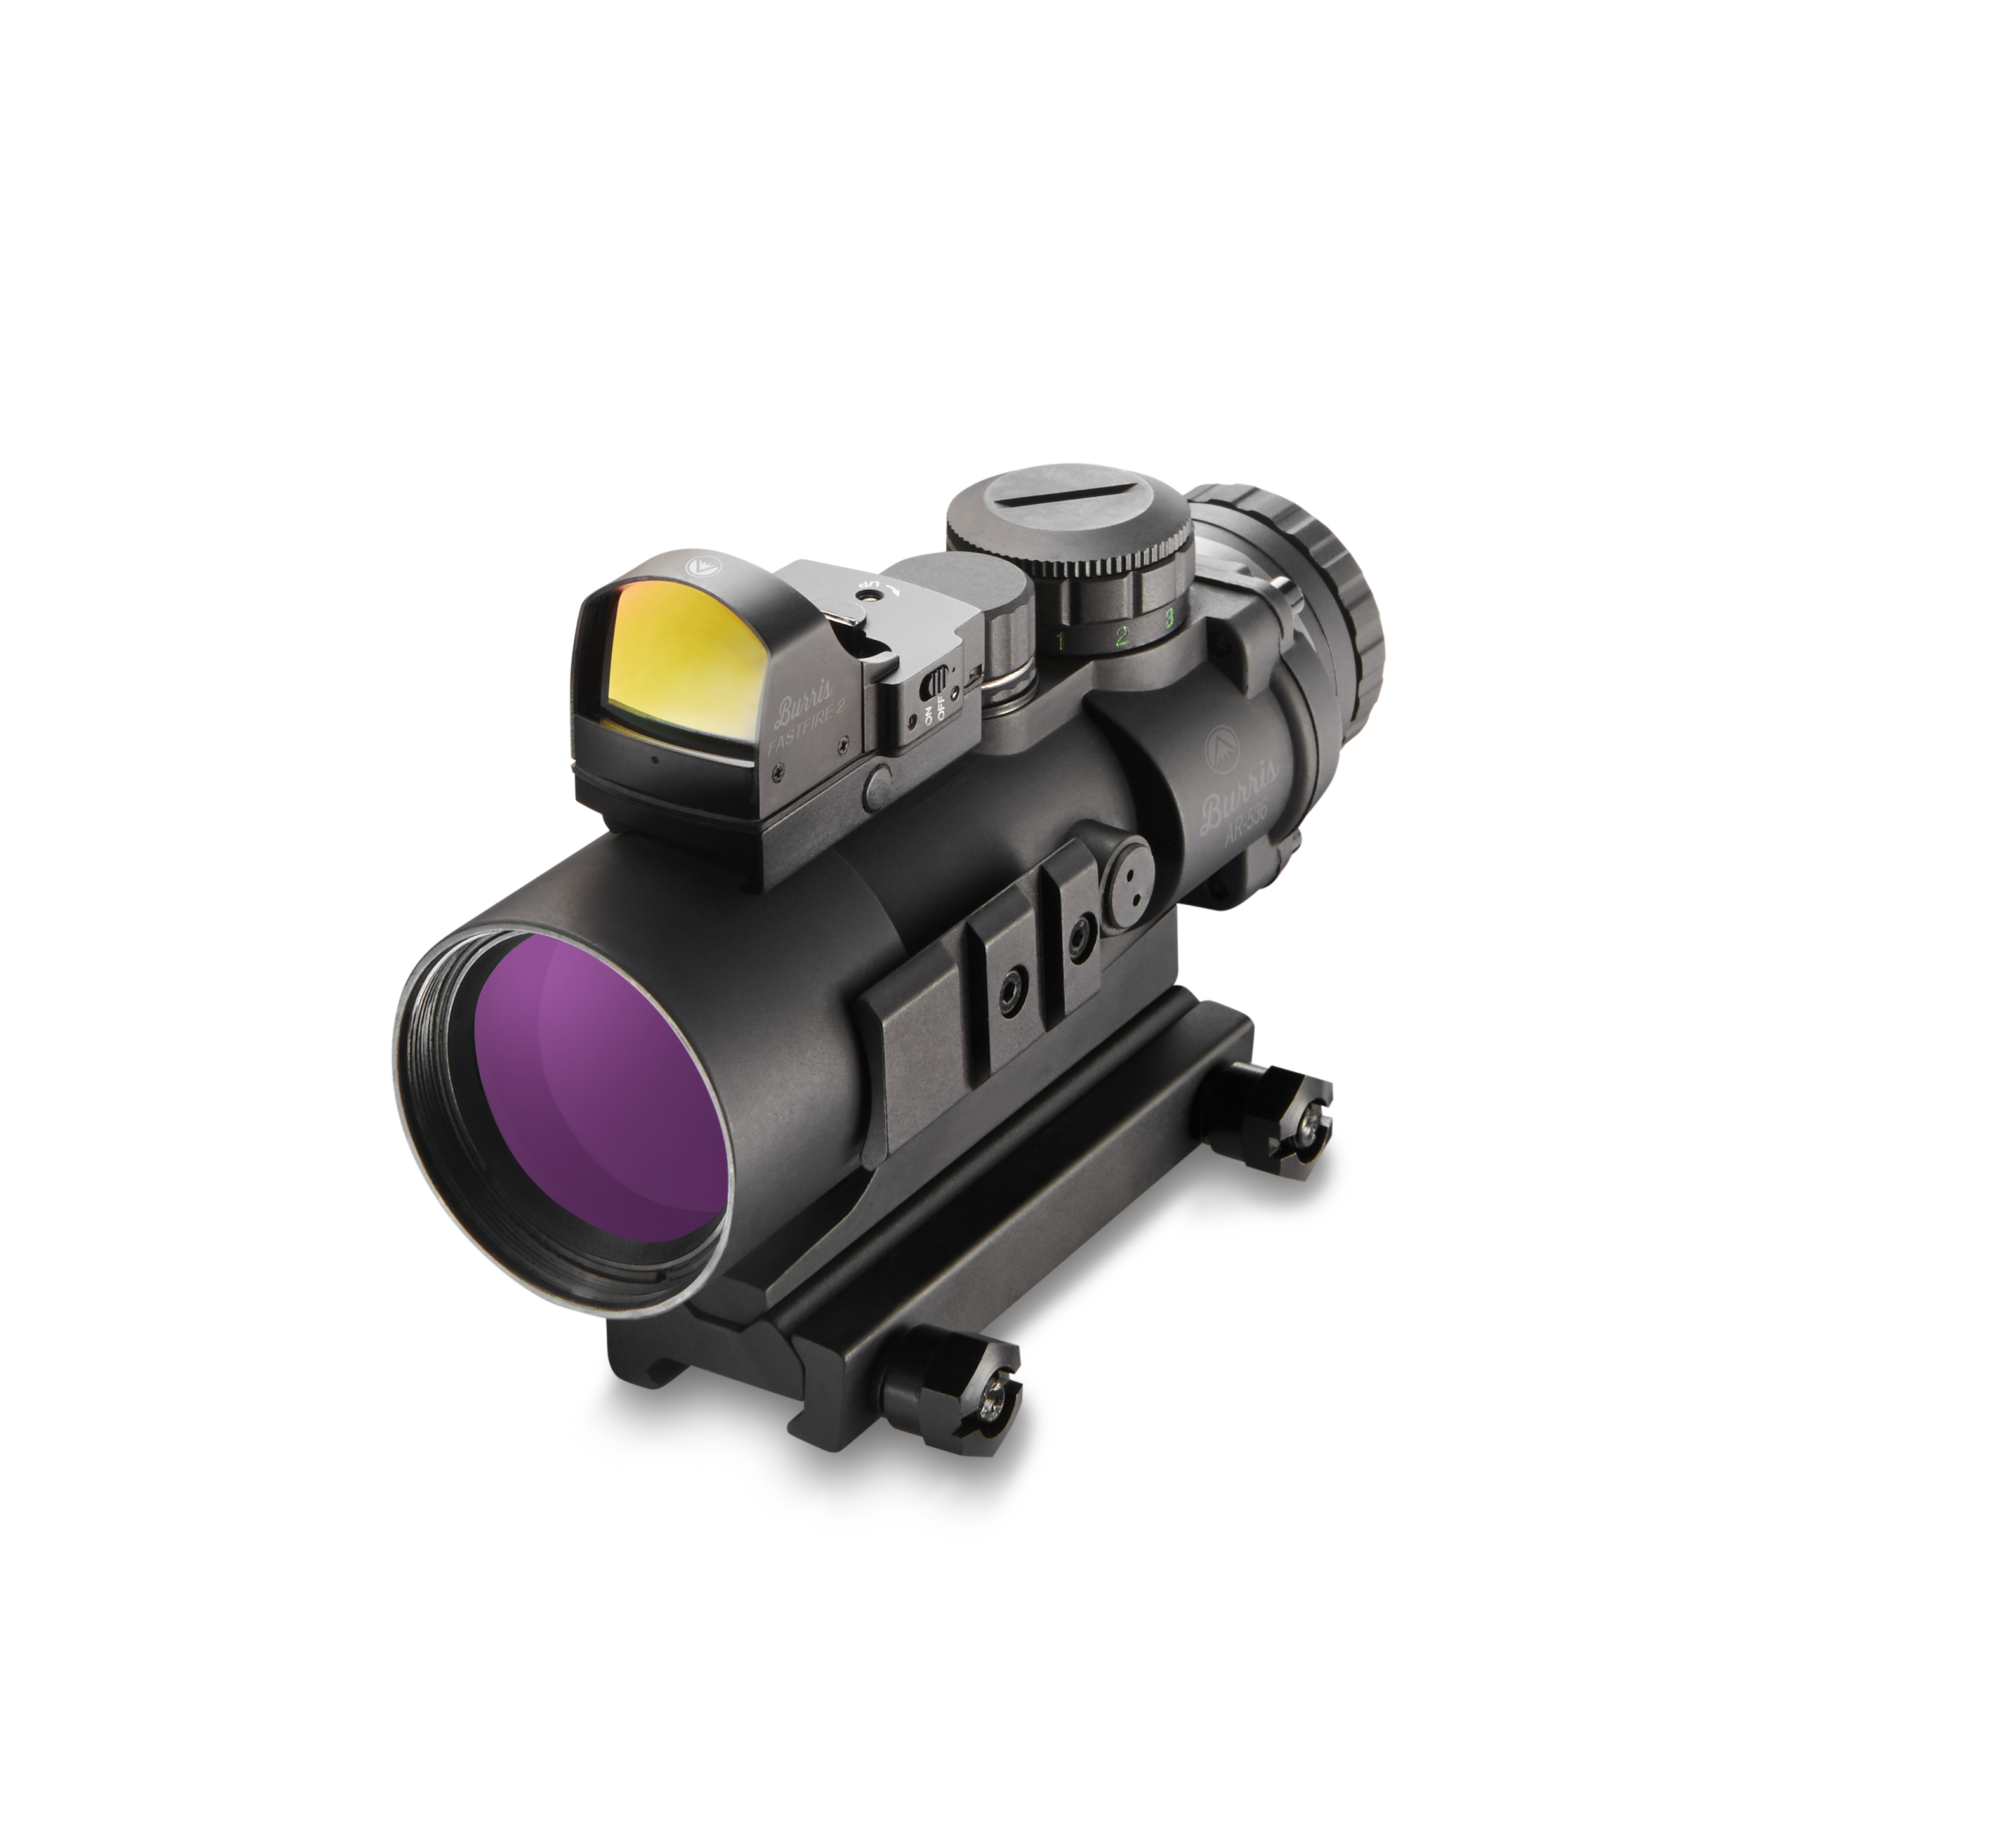 Burris Ar 536 5x 36mm Red Dot Sight Kit Ballistic Cq Reticle Free